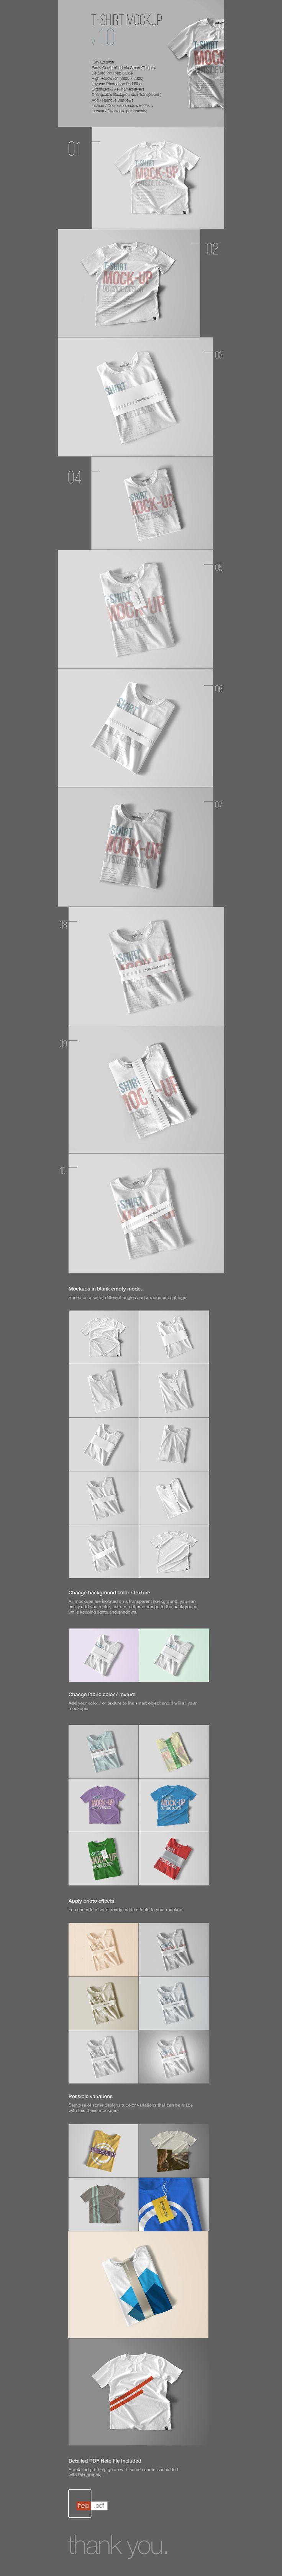 T shirt design app for ipad - Free Psd T Shirt Mockup Template 96 Mb Themeraid Com